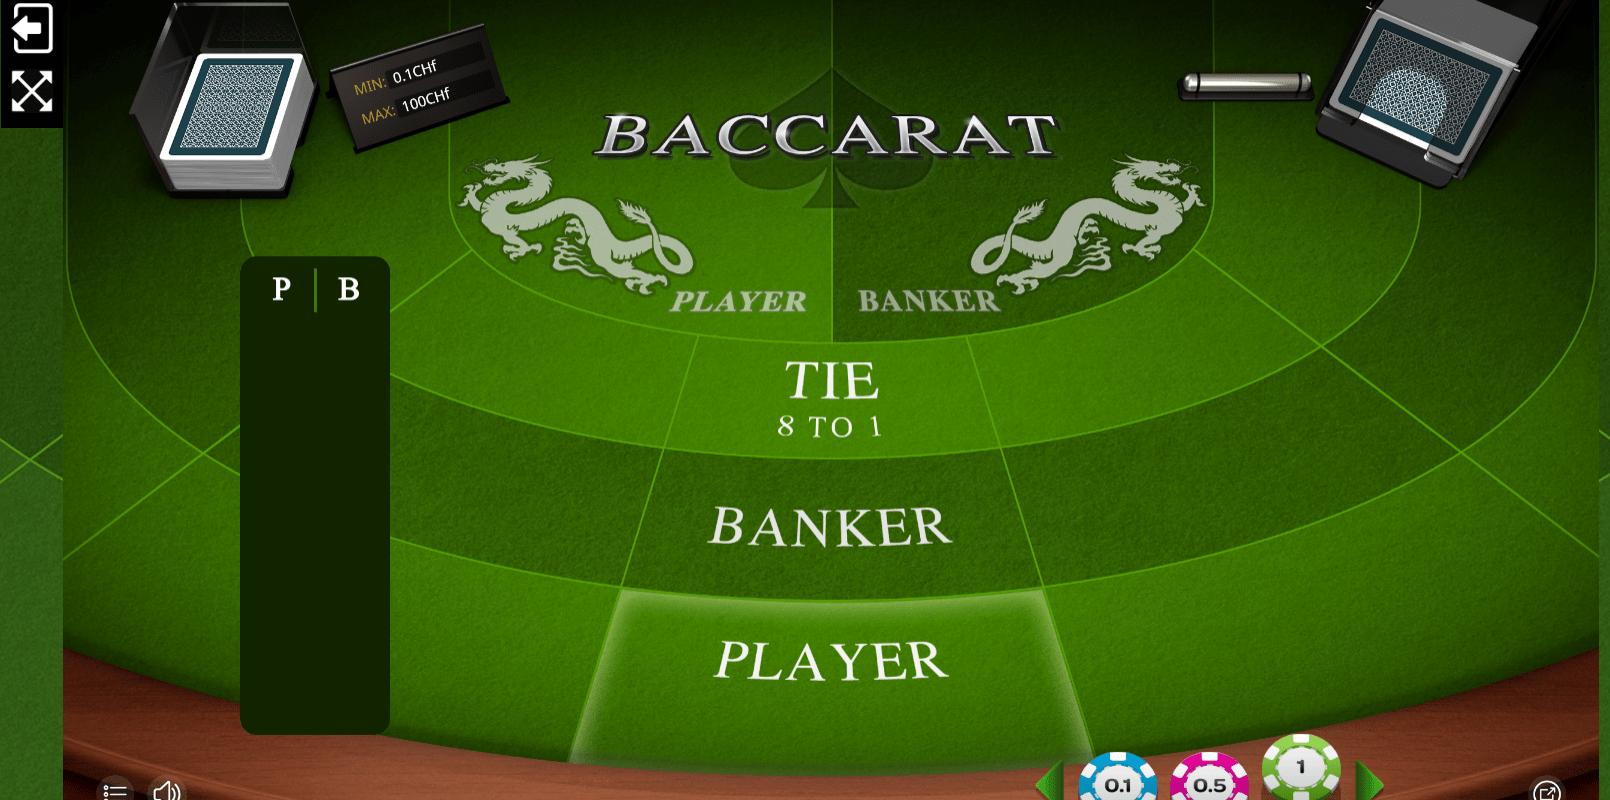 Baccarat spiele